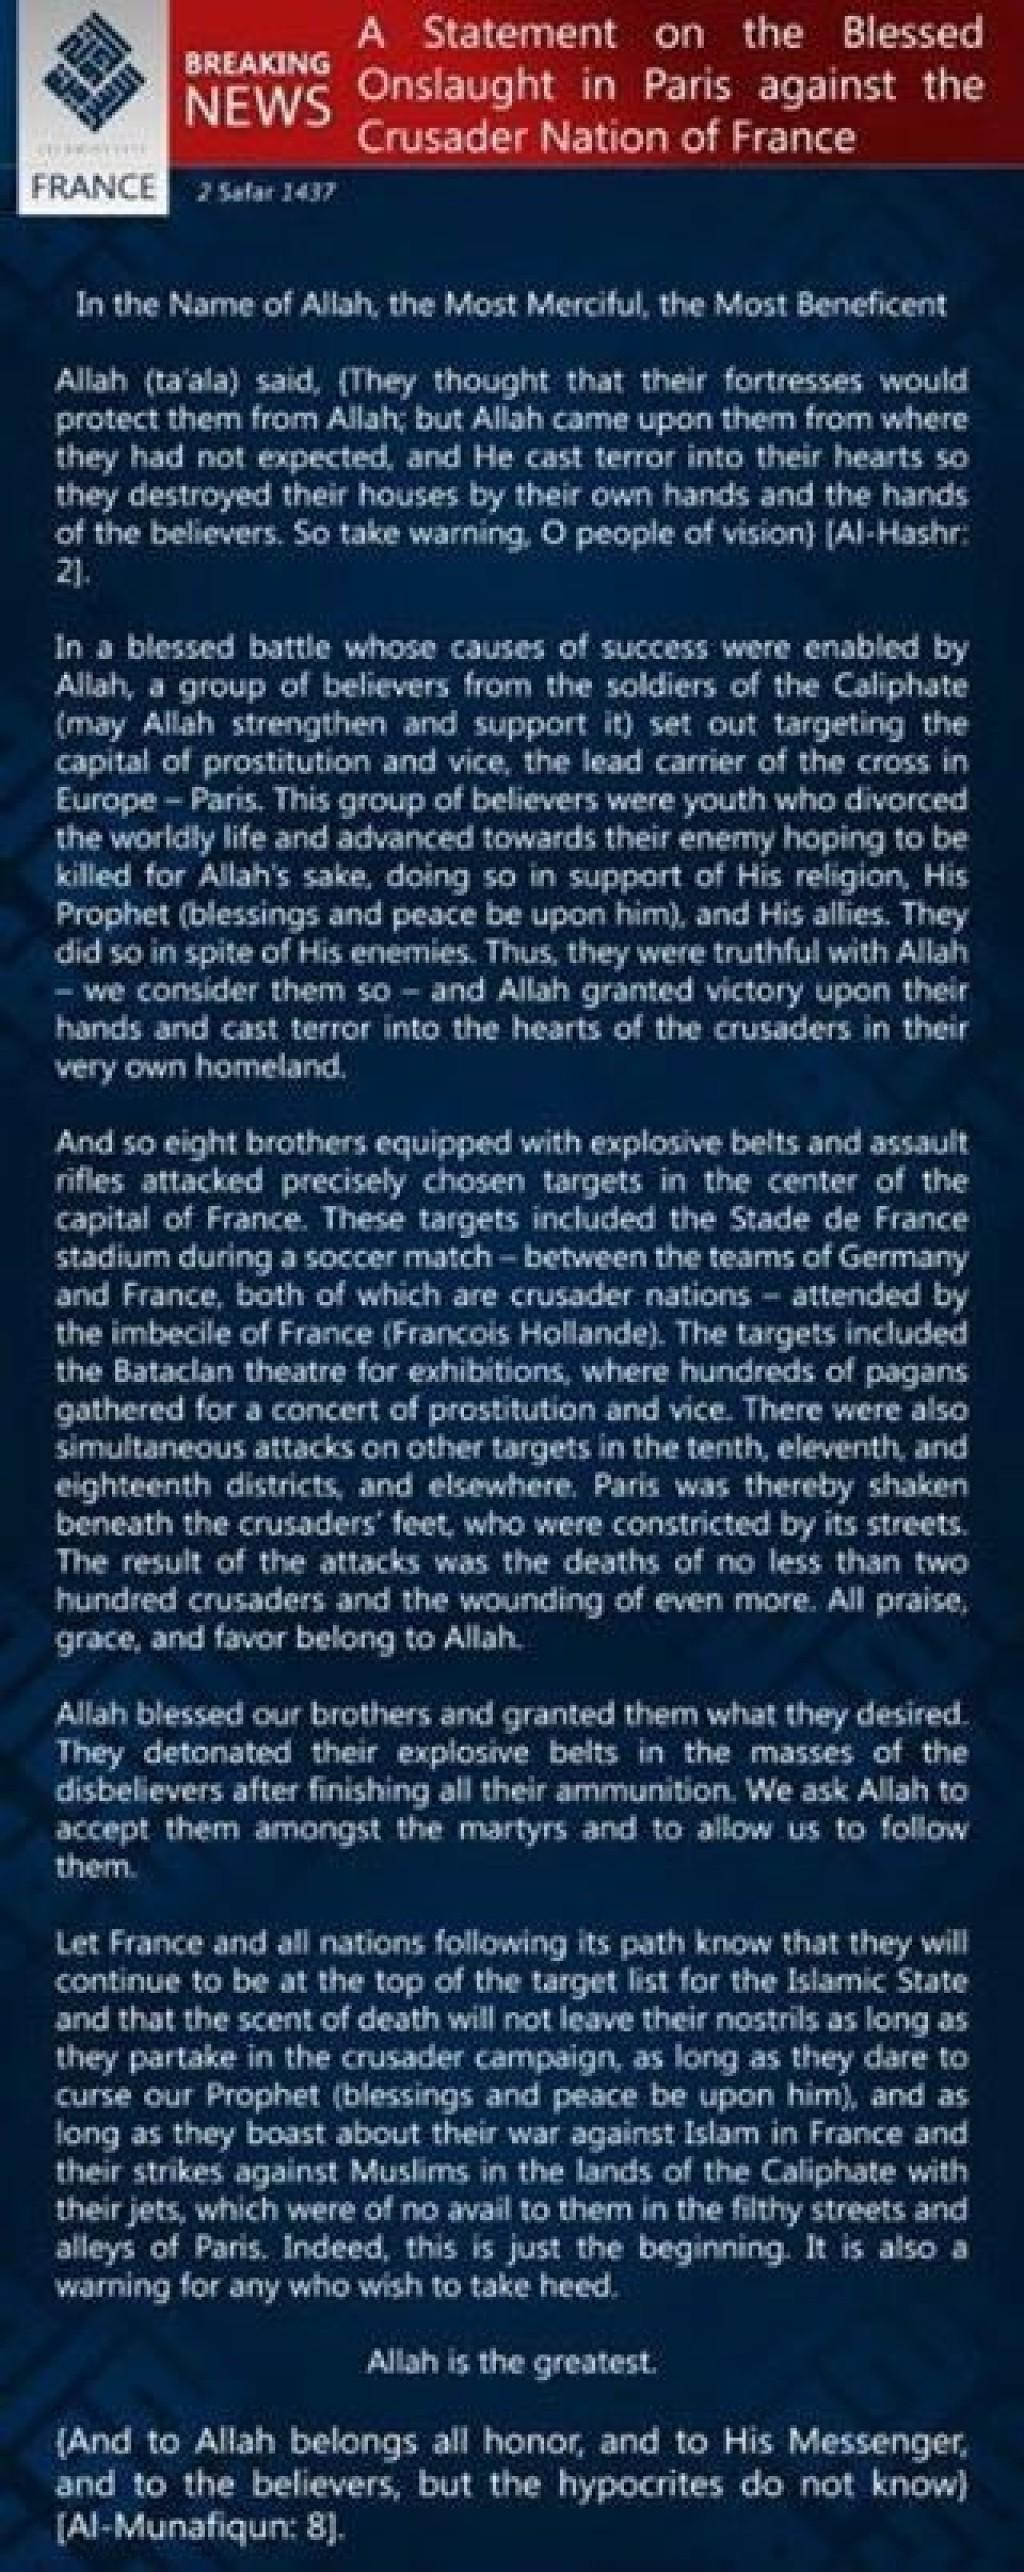 15-11-14 Islamic State claims Paris attacks